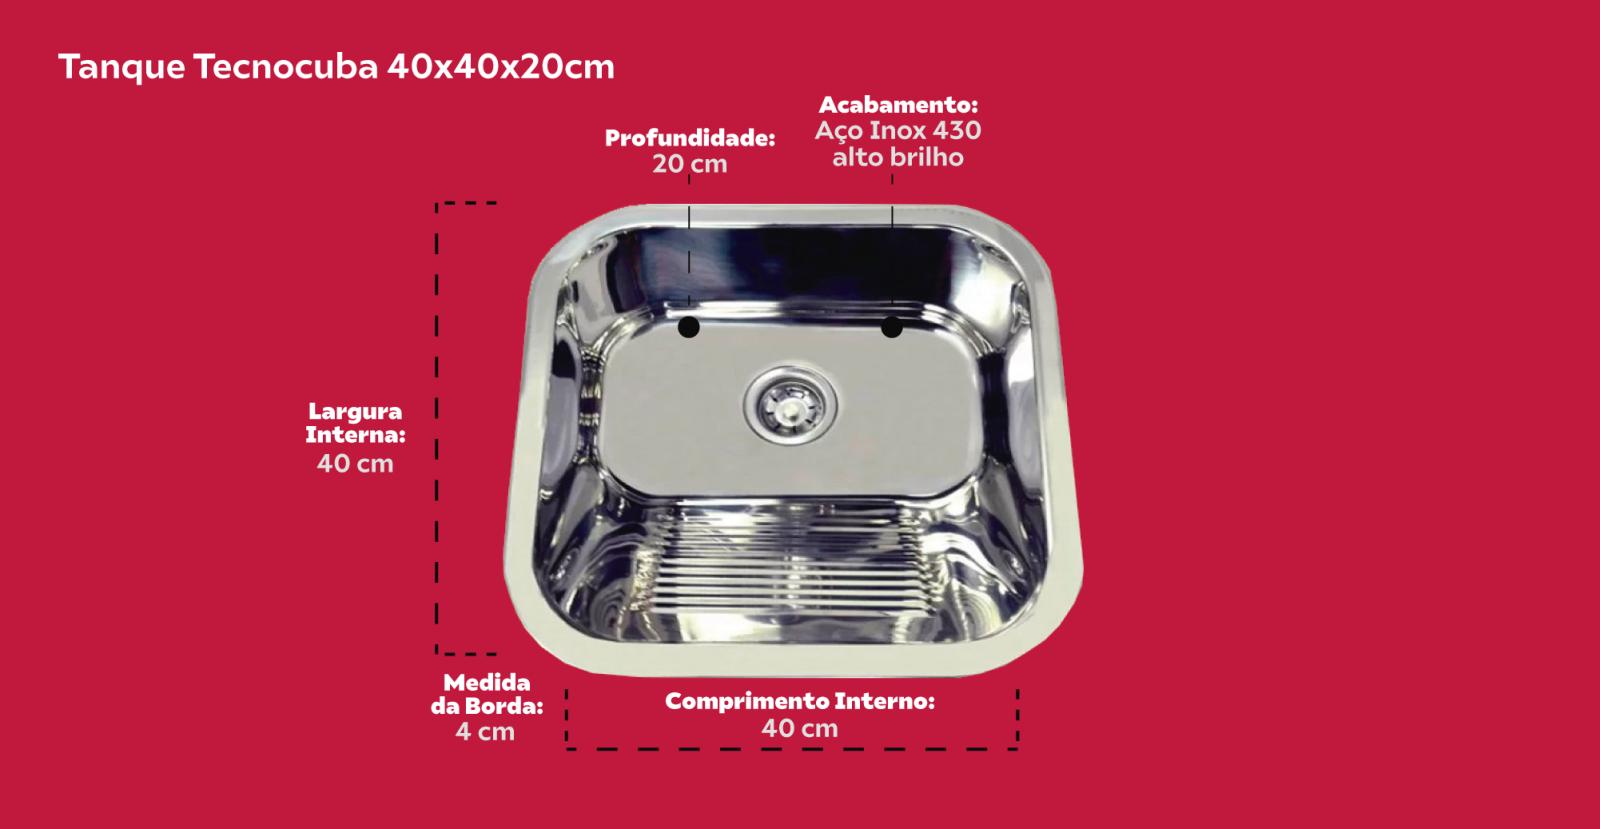 Combo Tecnocuba Cuba Inox 40x34x14cm e Tanque Inox 40x40x20cm